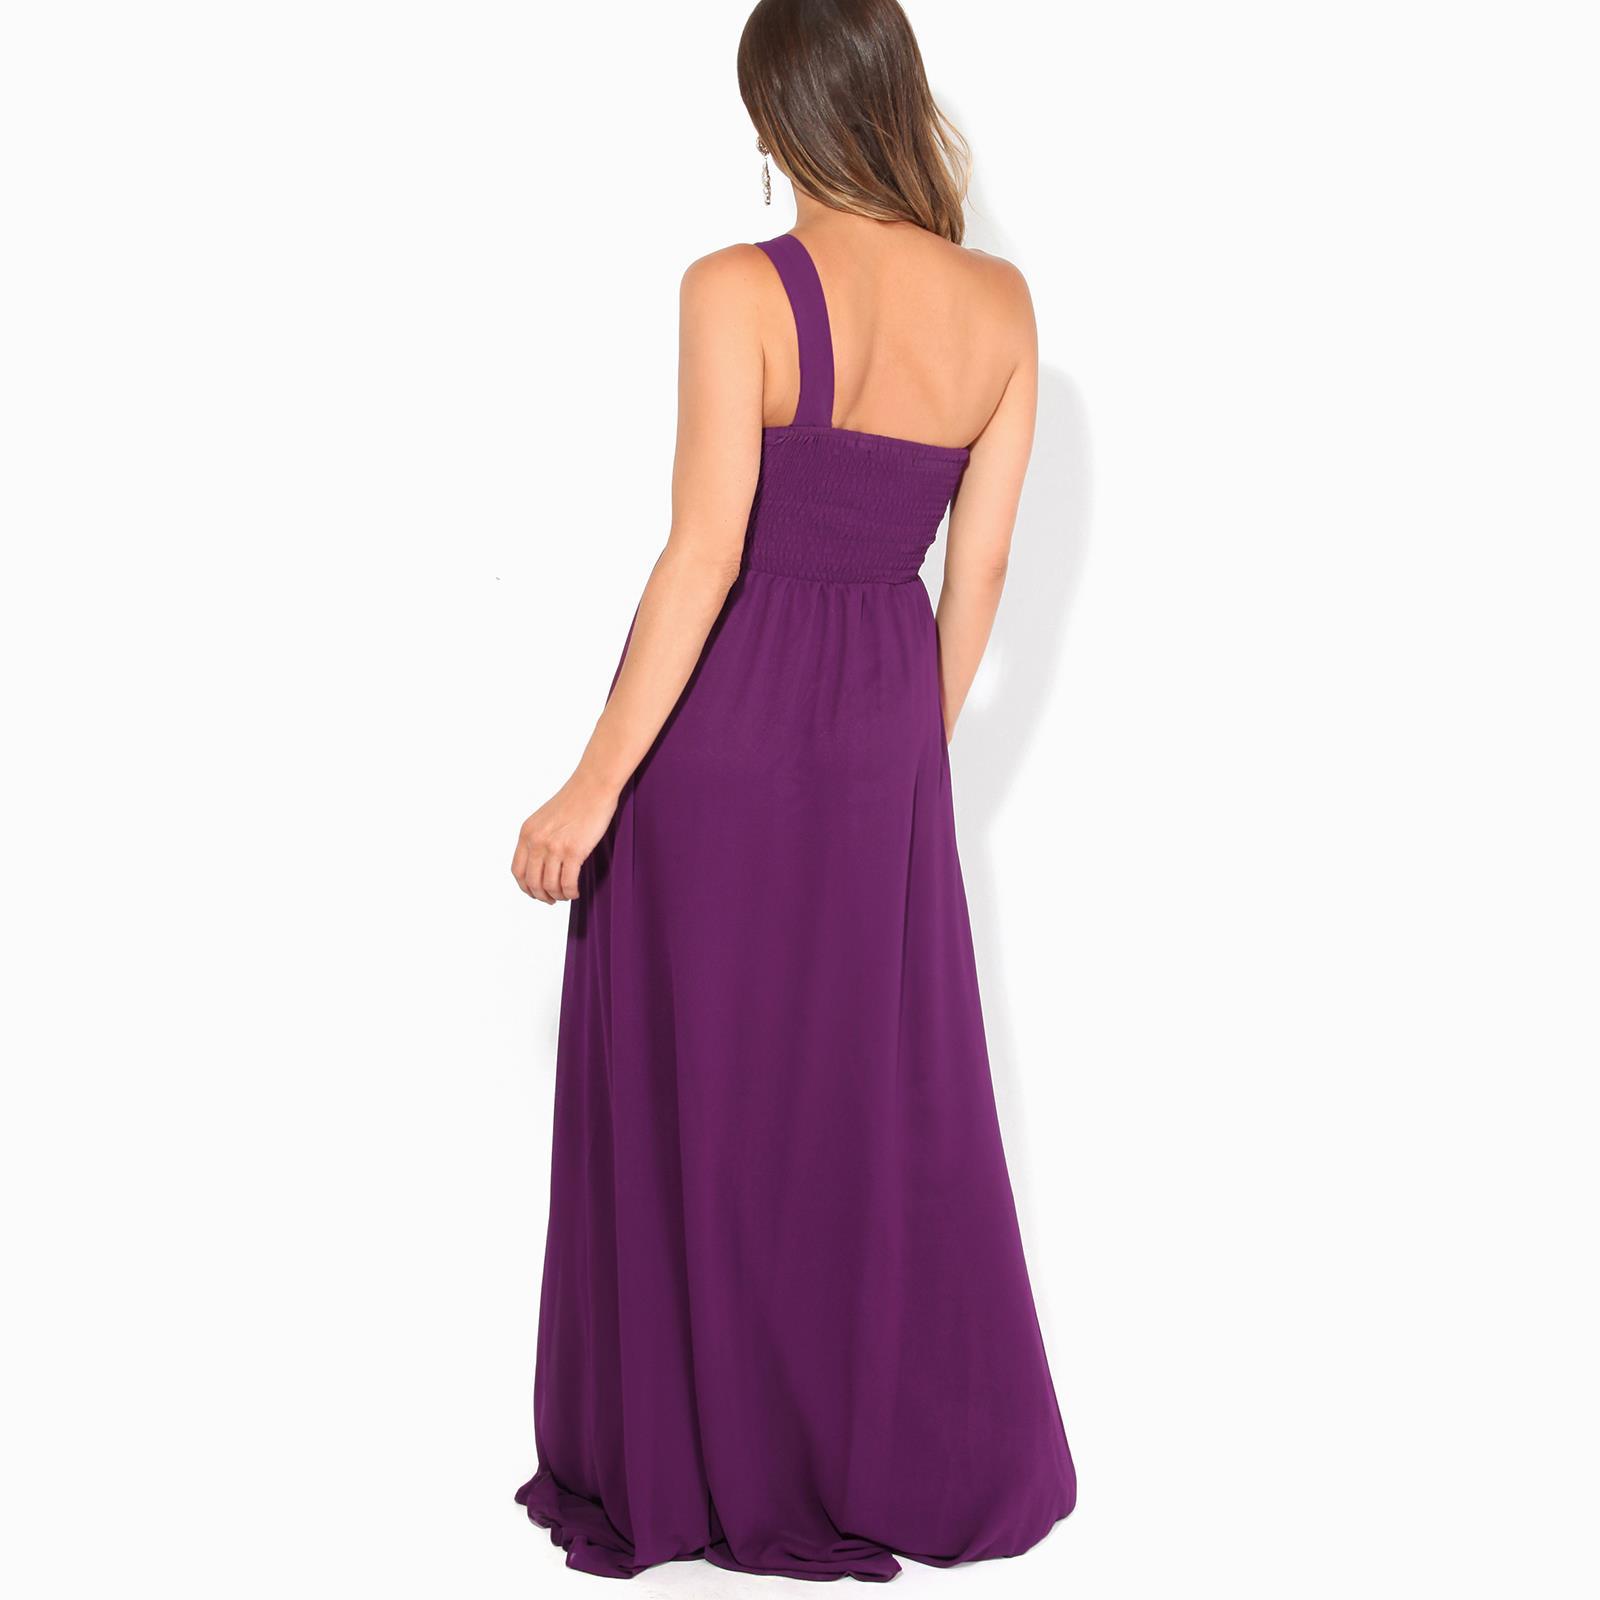 Womens-Wedding-Bridesmaid-Prom-Dress-Formal-One-Off-Shoulder-Long-Evening-8-18 thumbnail 53